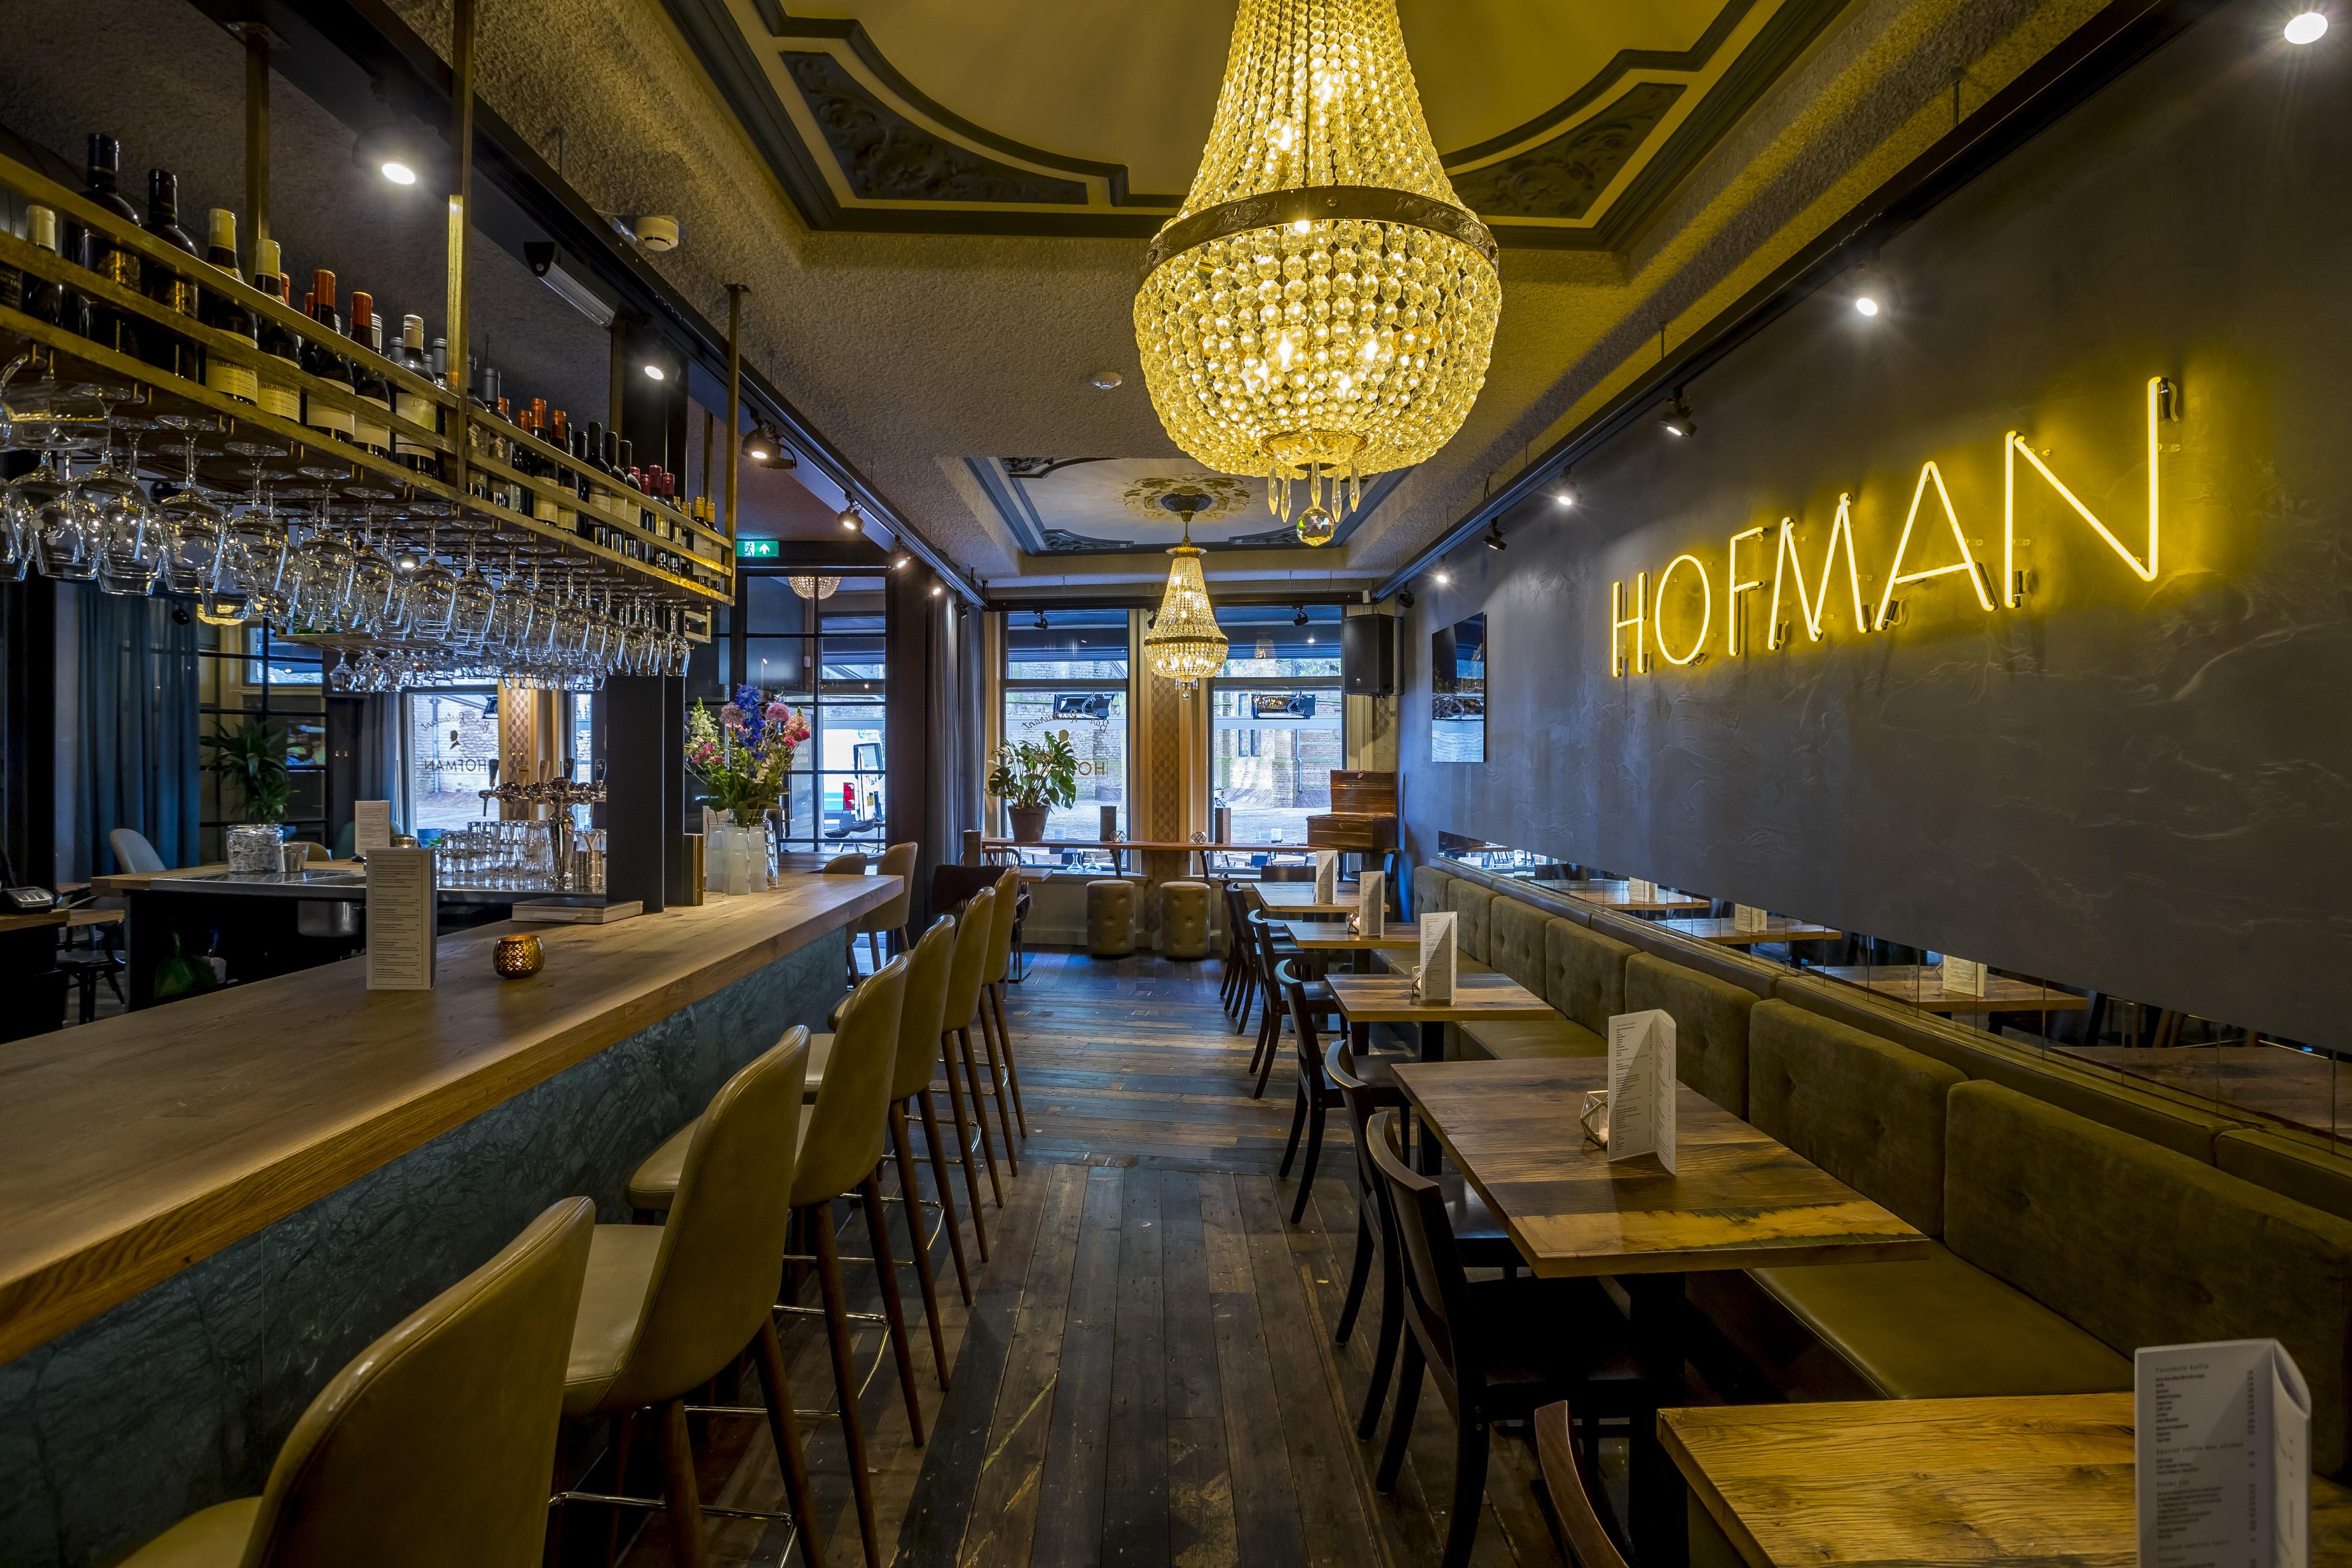 Bar Restaurant Hofman Alkmaar